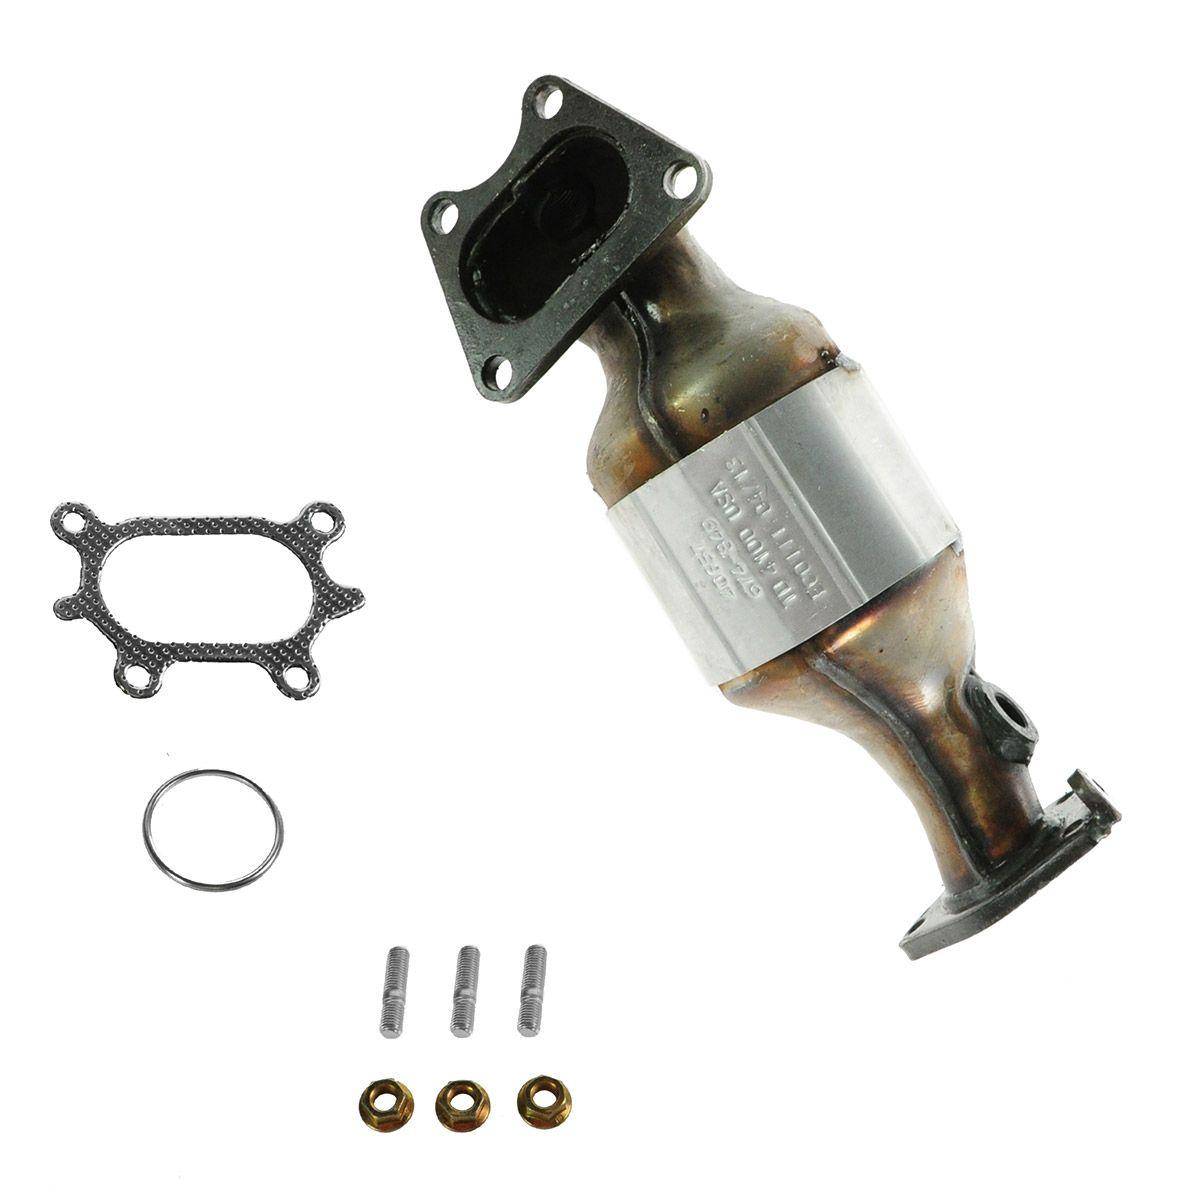 Dorman Exhaust Manifold w/ Catalytic Converter V6 RH for Accord Pilot TL MDX